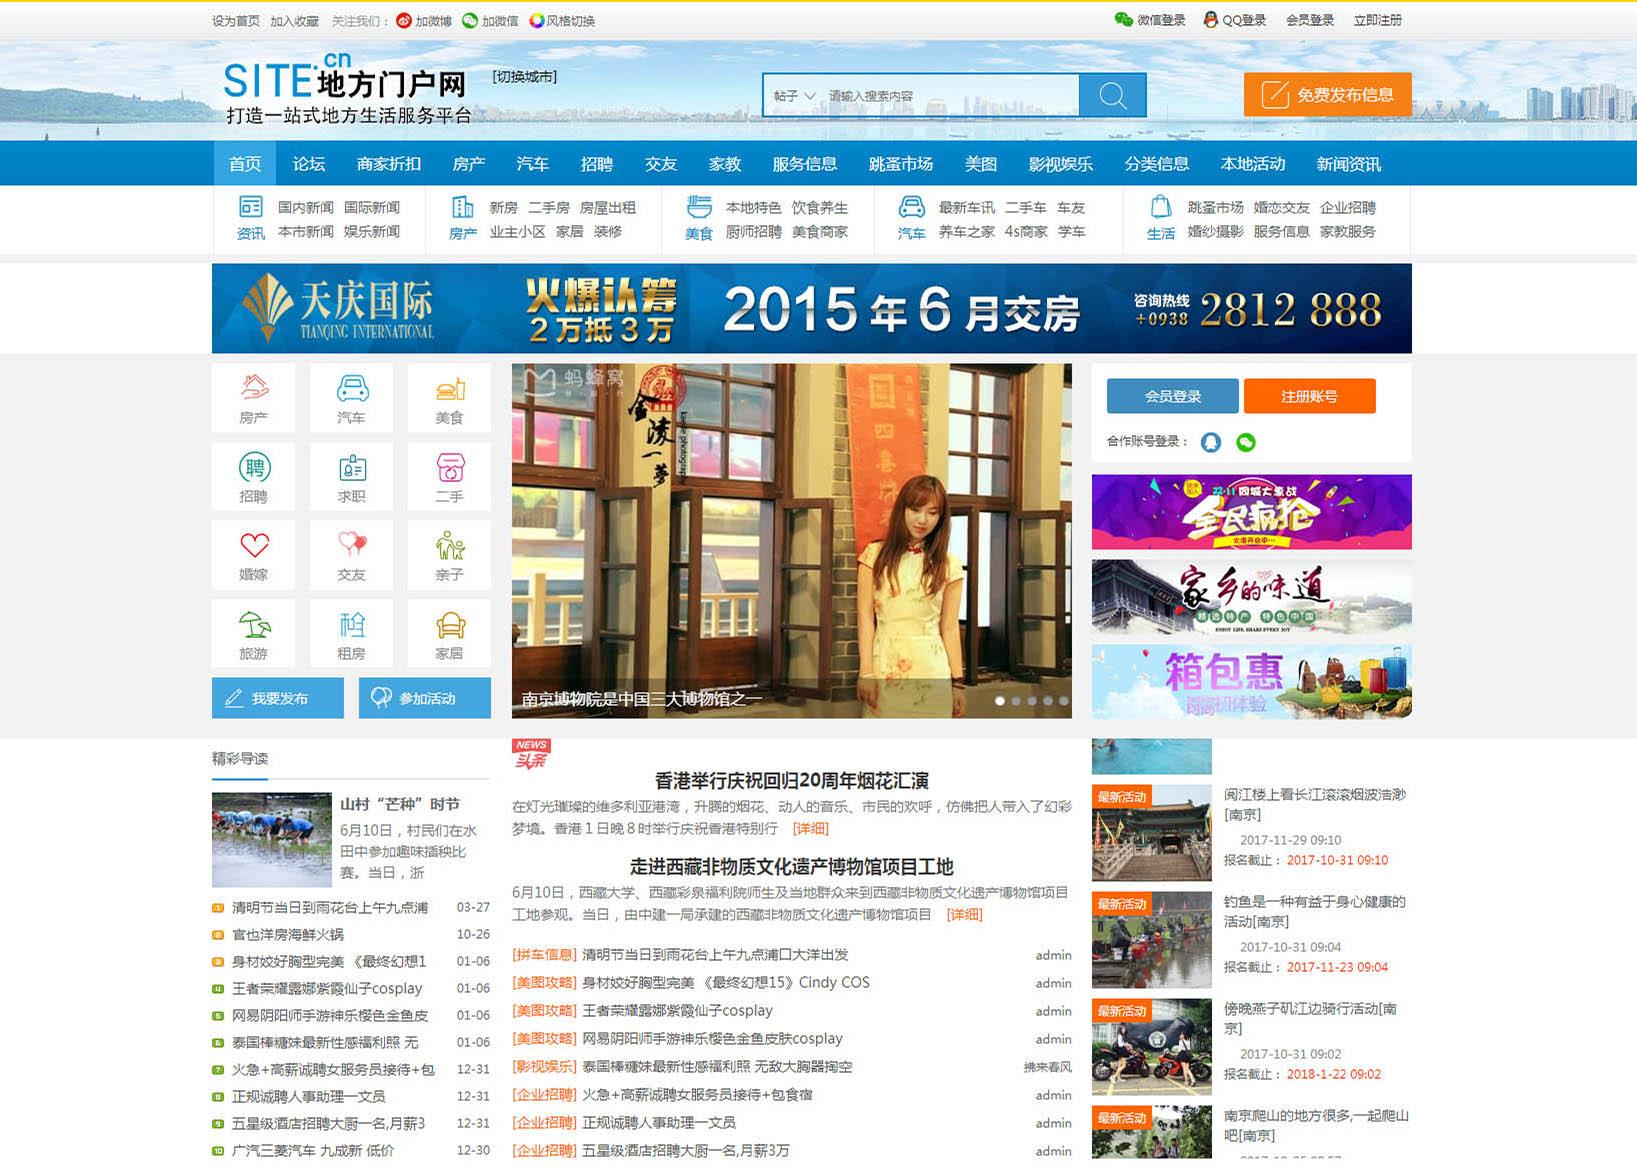 Discuz地方门户城市自适应PC和手机版网站模板源码